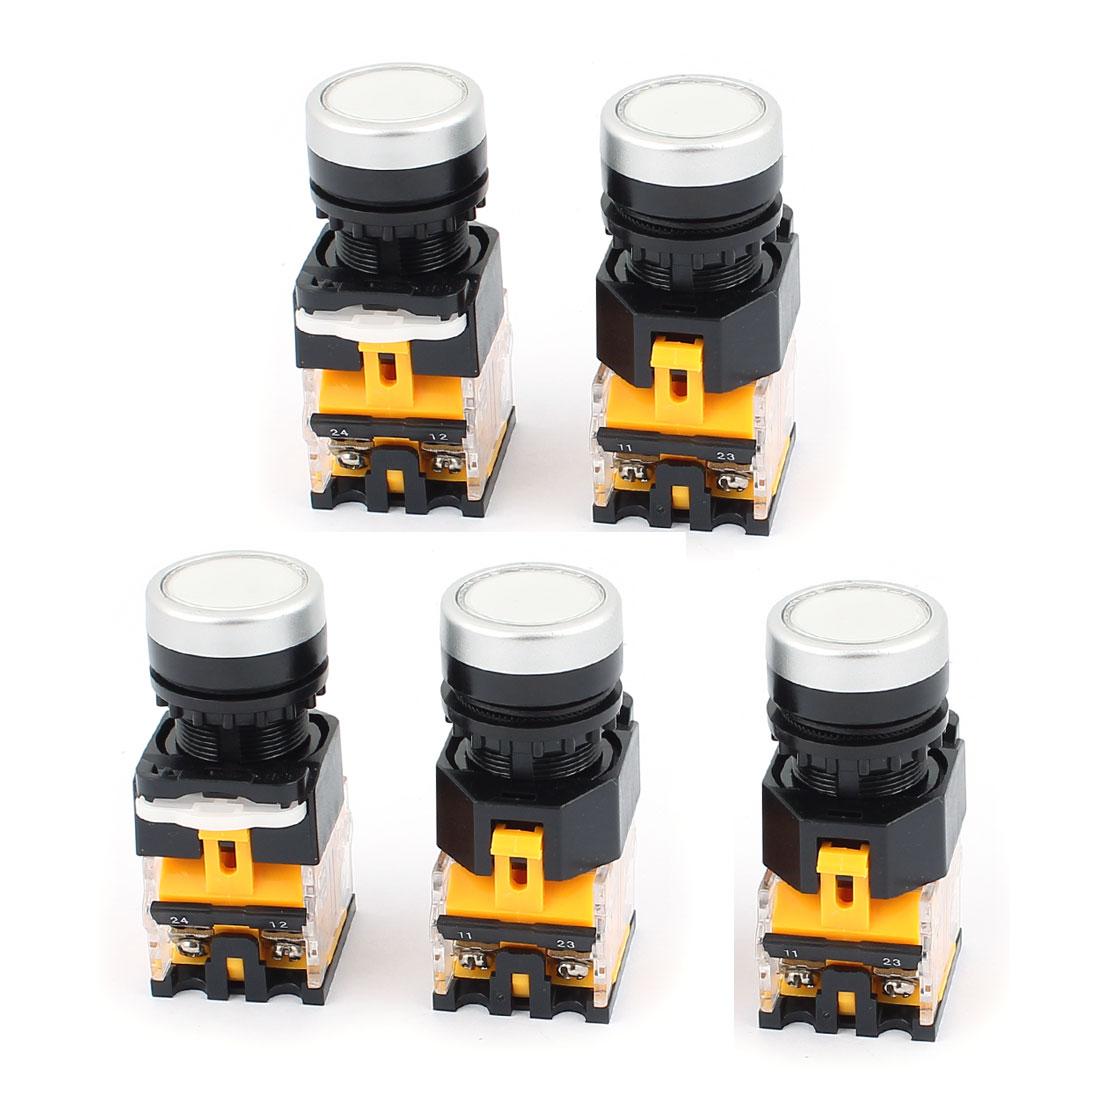 AC 660V 10A NO NC 4-Pin Momentary White Push Button Switch 5PCS